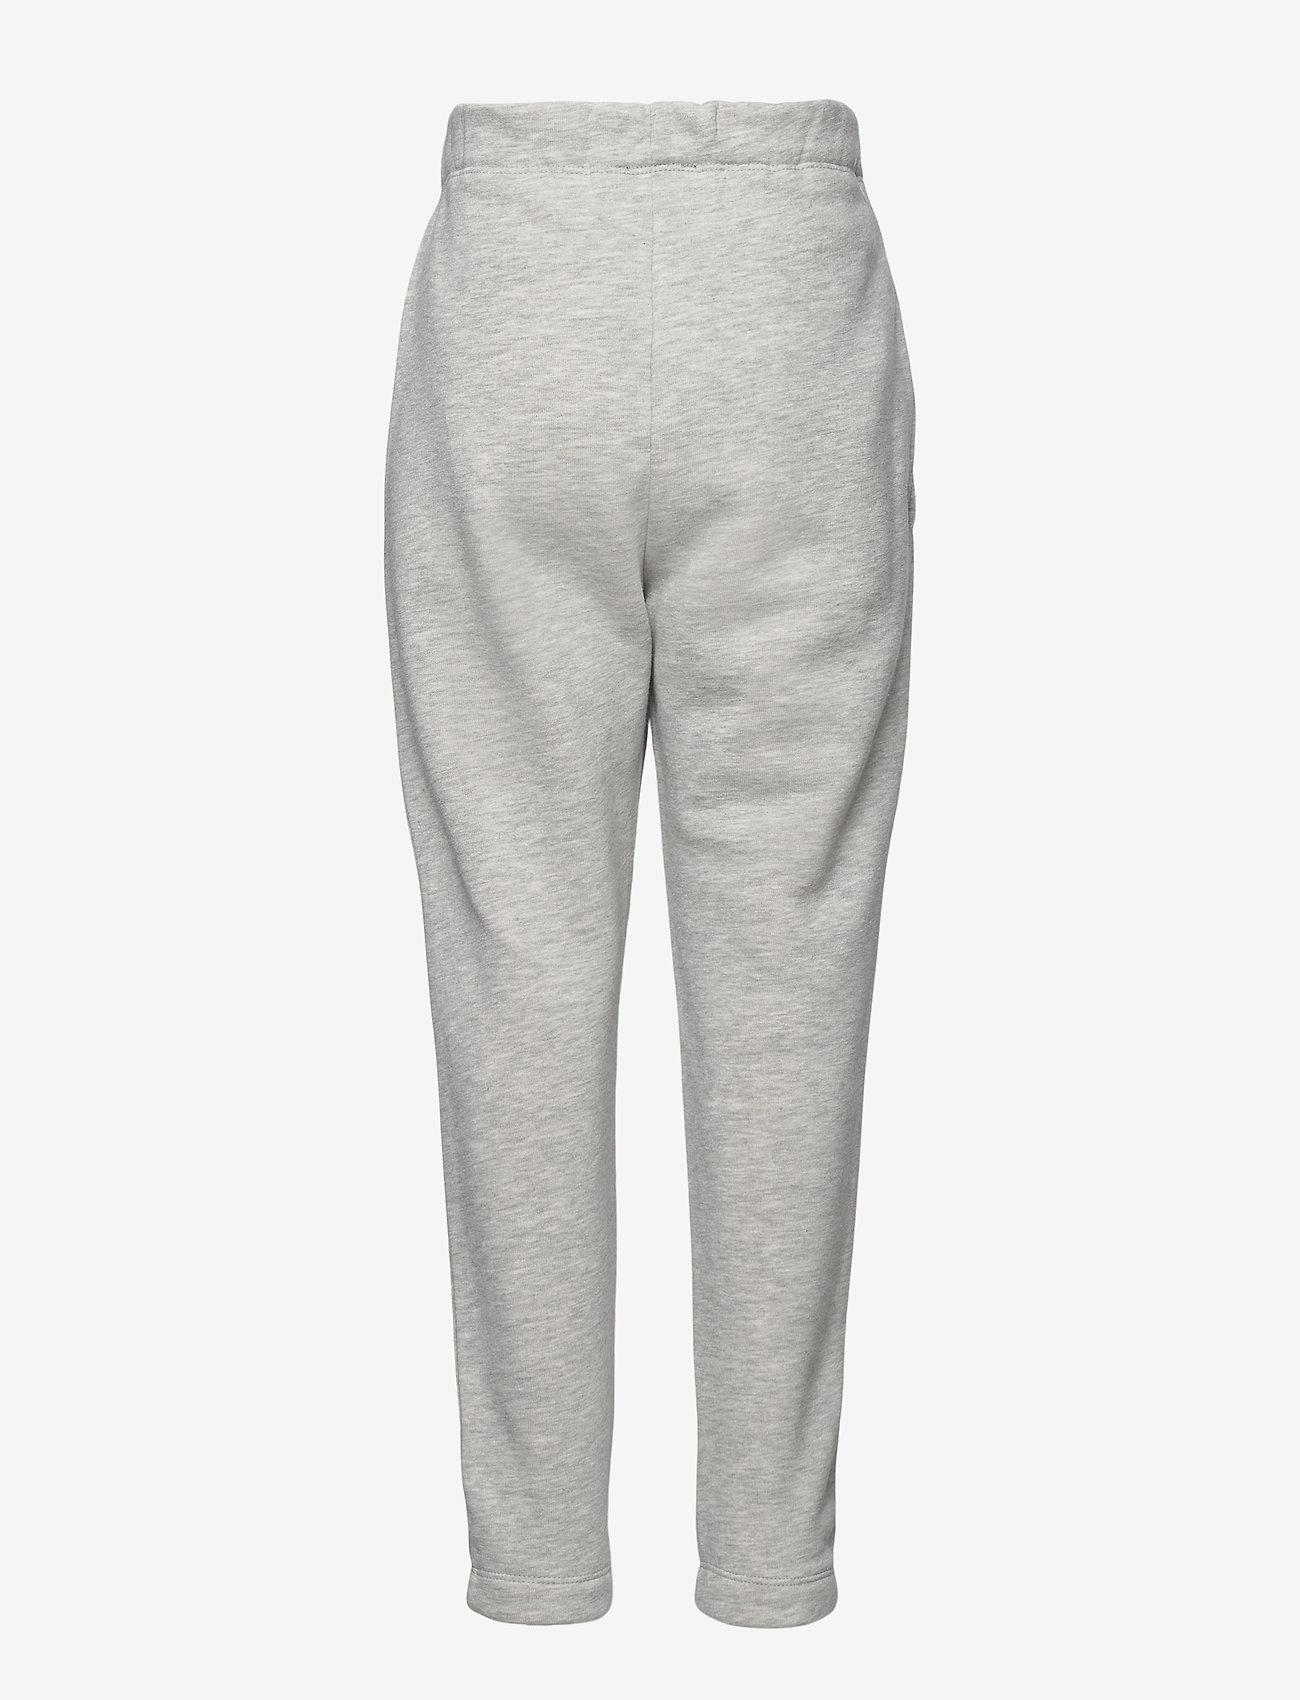 LMTD - NLFOPAL R SWEAT PANT NOOS - jogginghosen - grey melange - 1